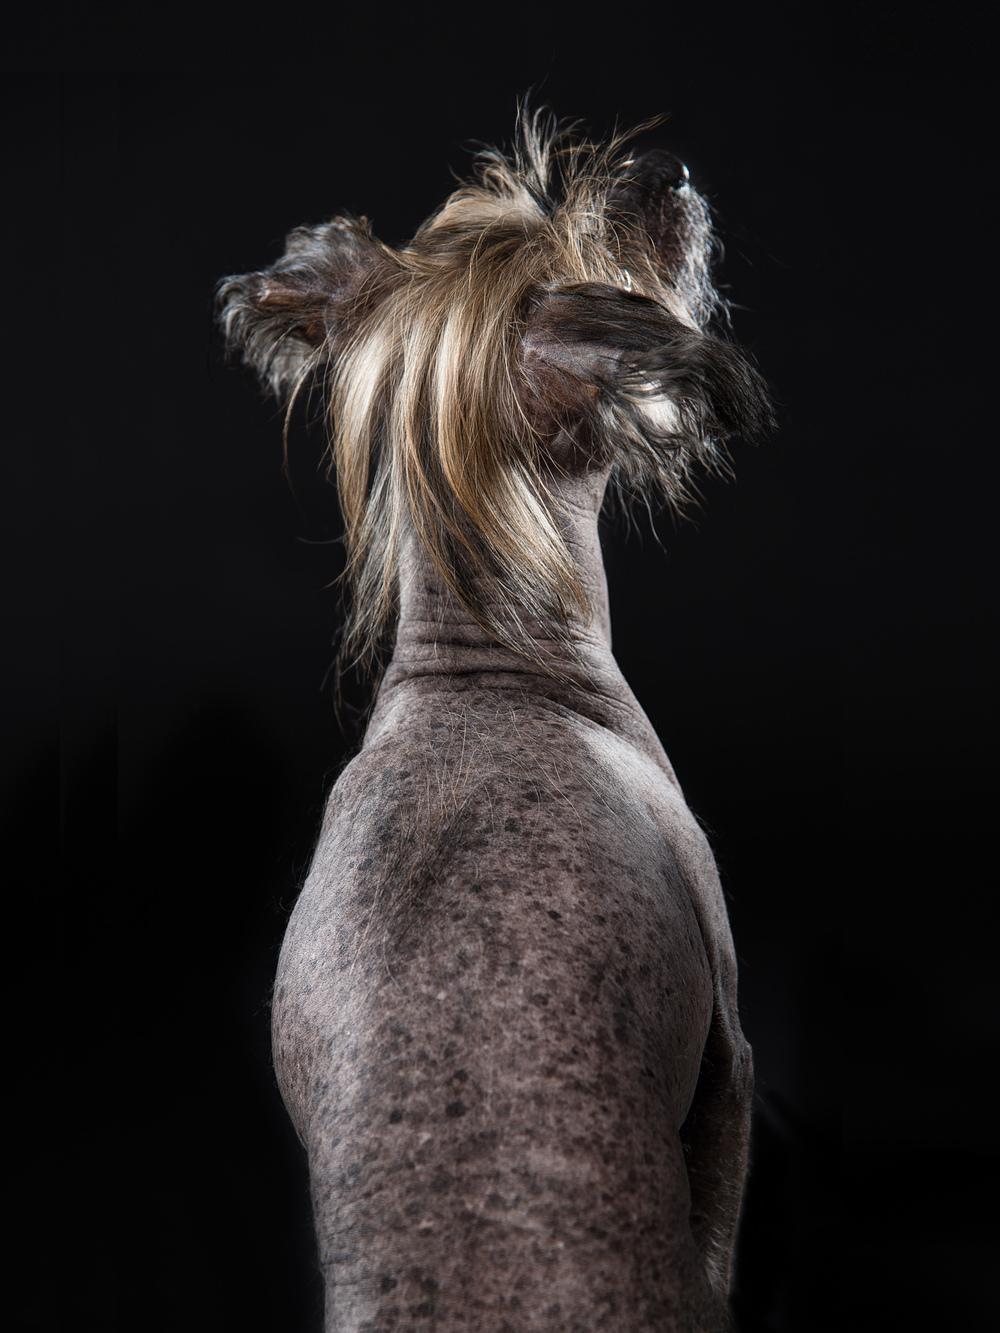 naked-dogs-klausdyba-1.jpg